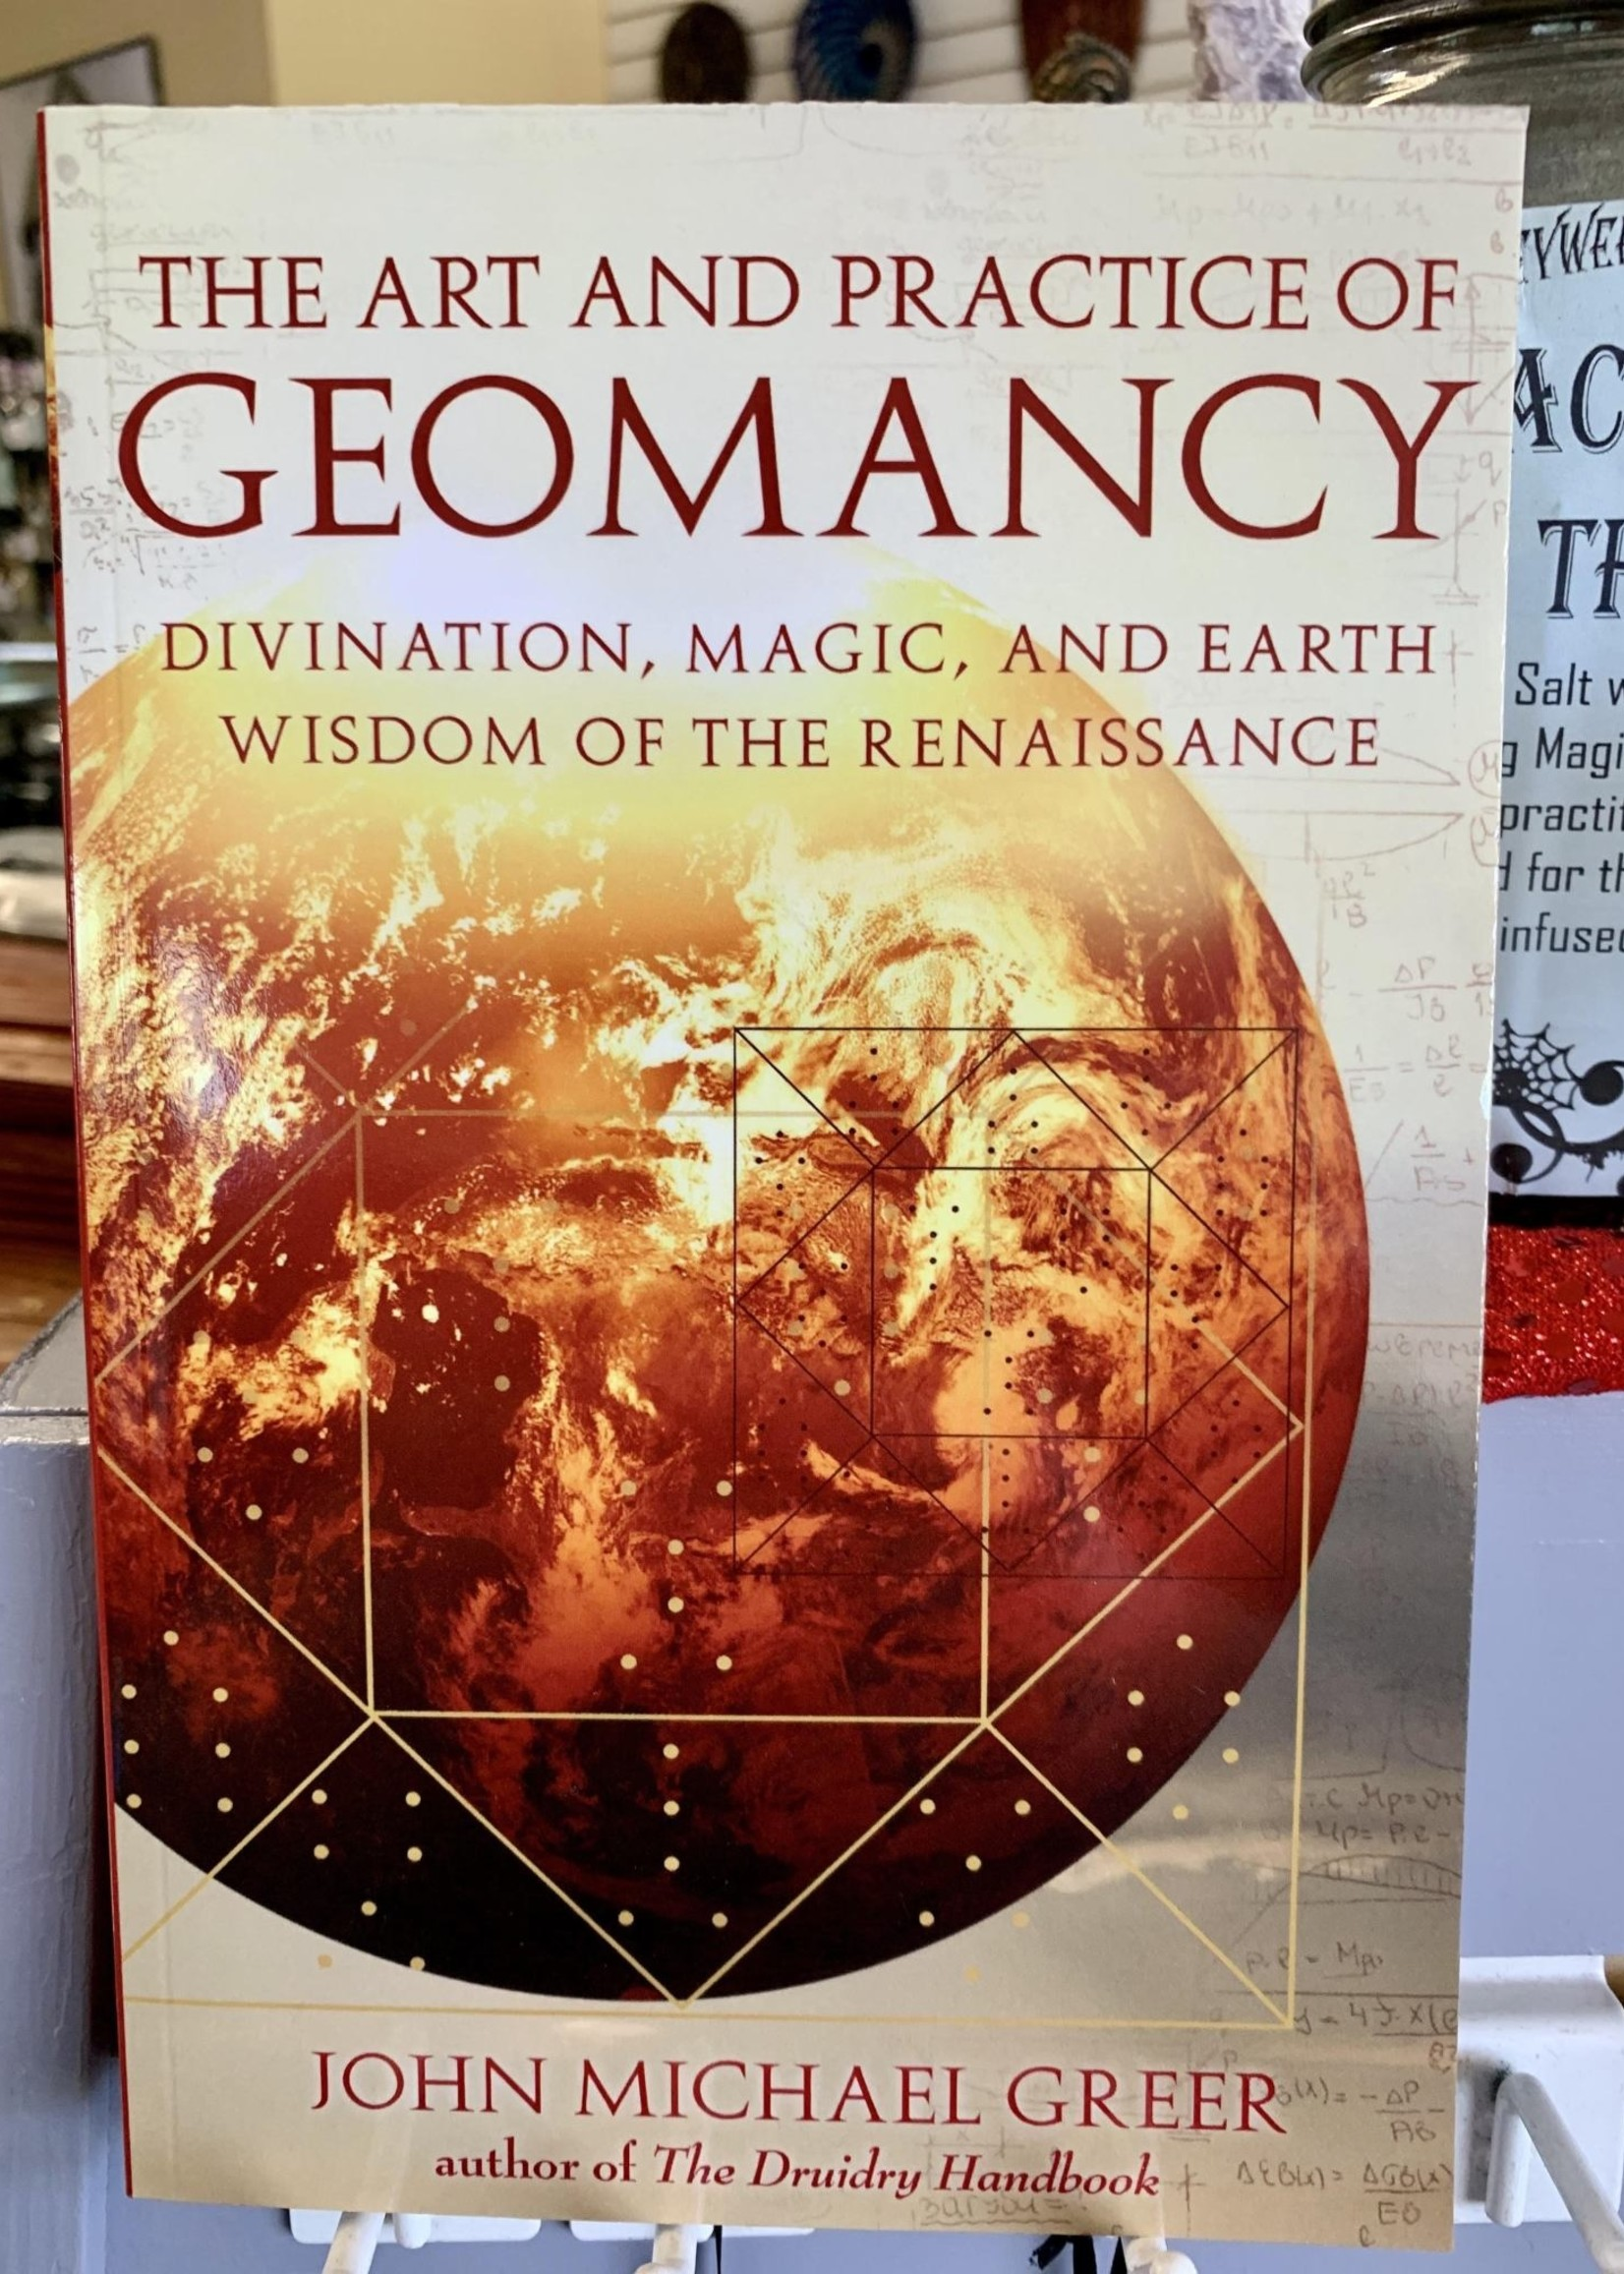 The Art and Practice of Geomancy - John Michael Greer